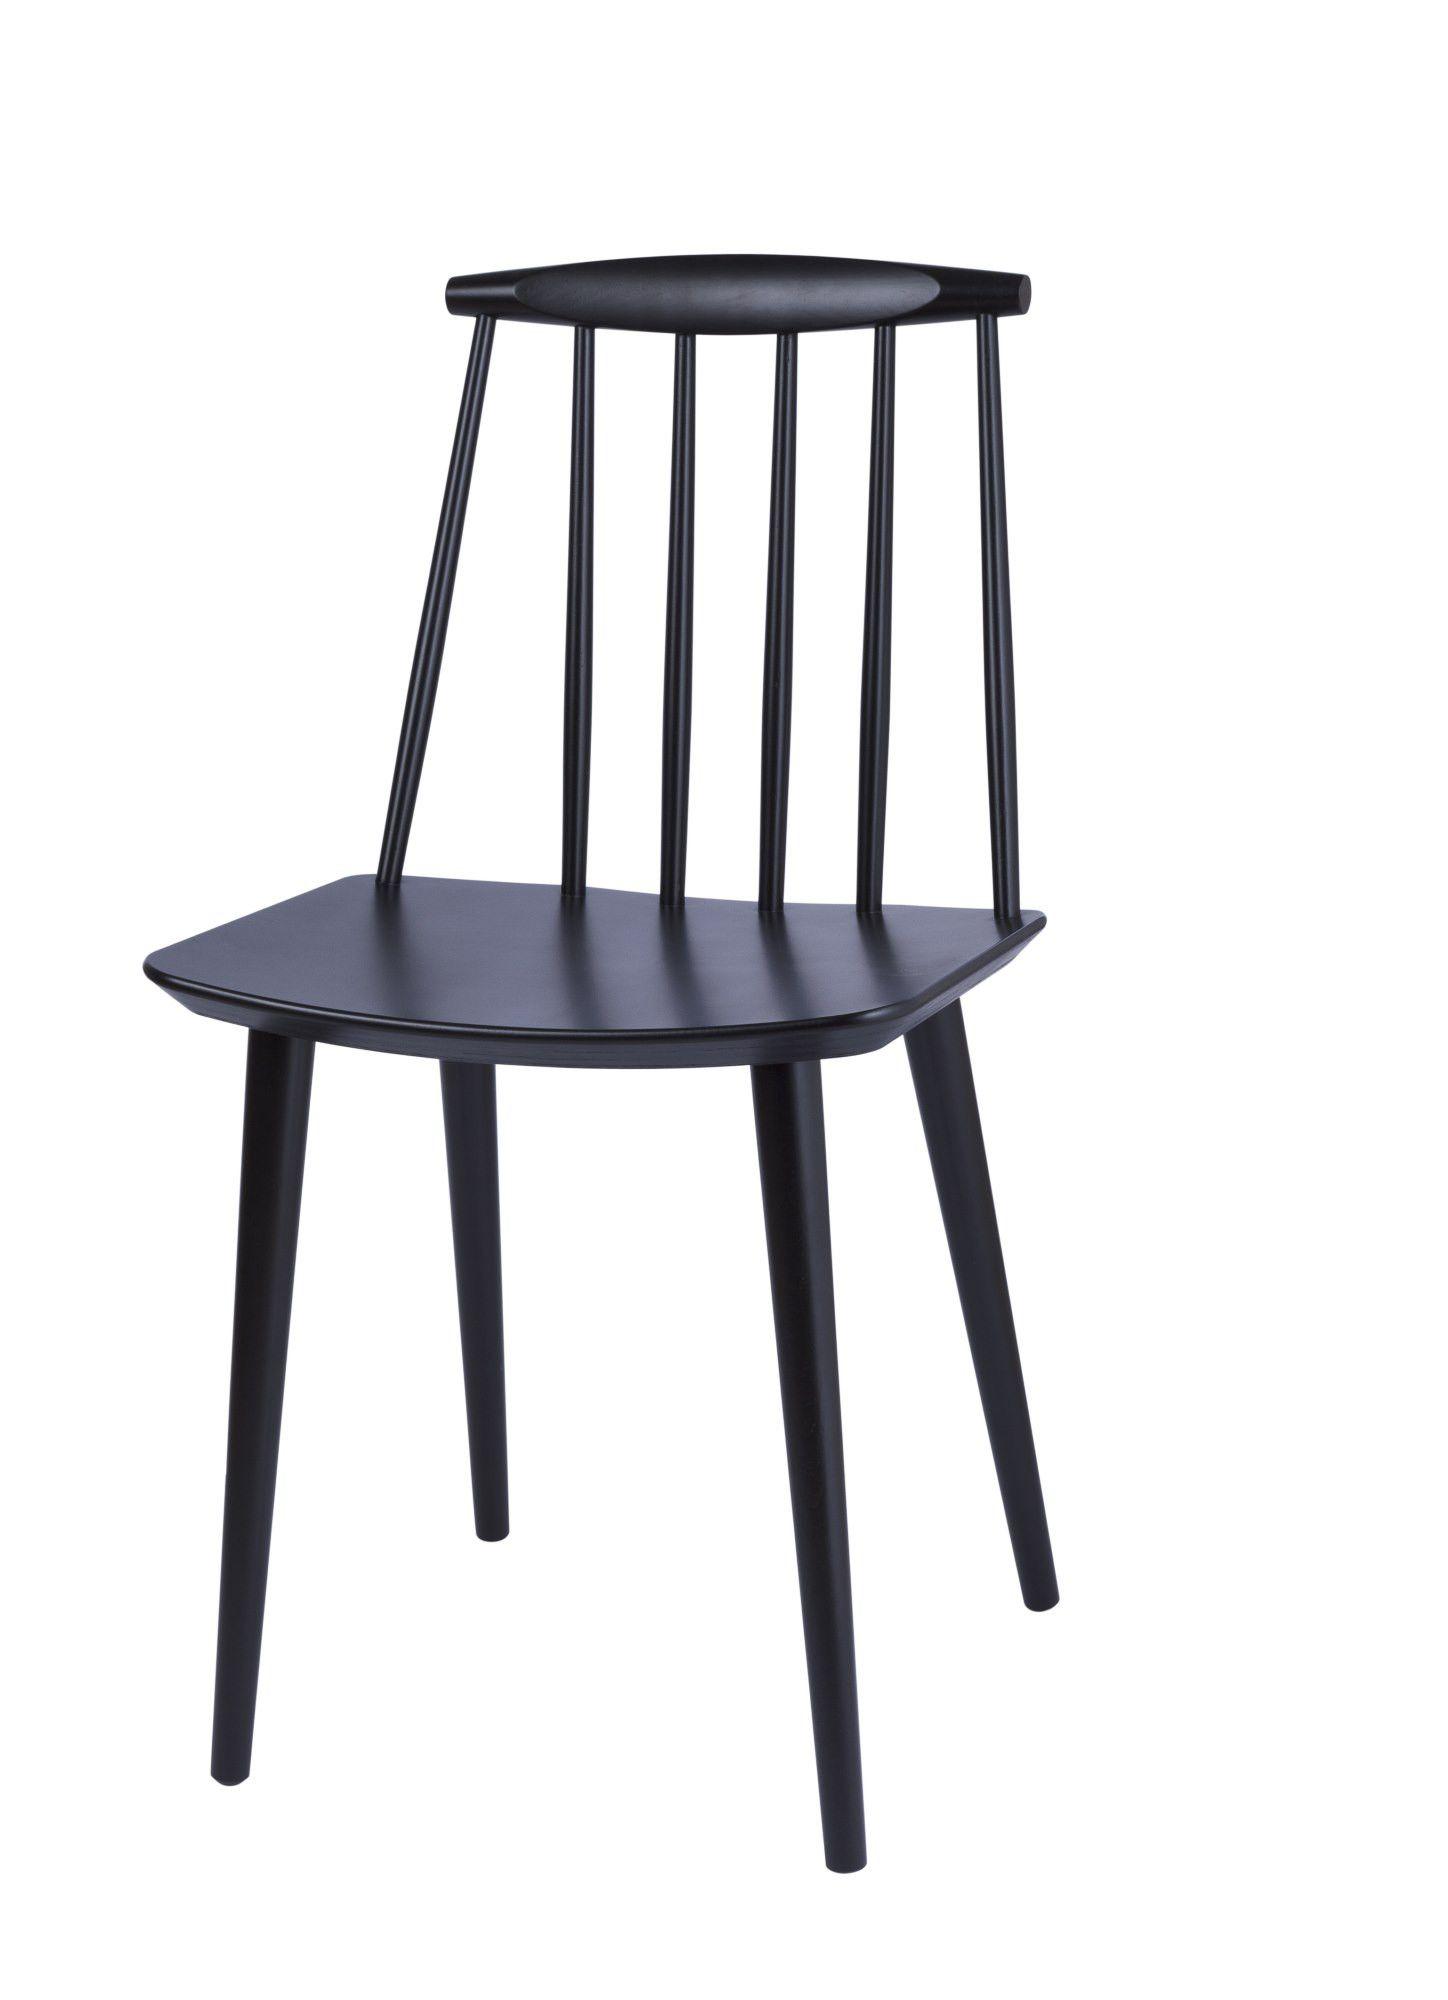 Einrichten Design De http einrichten design de de j77 chair stuhl hay html chairs